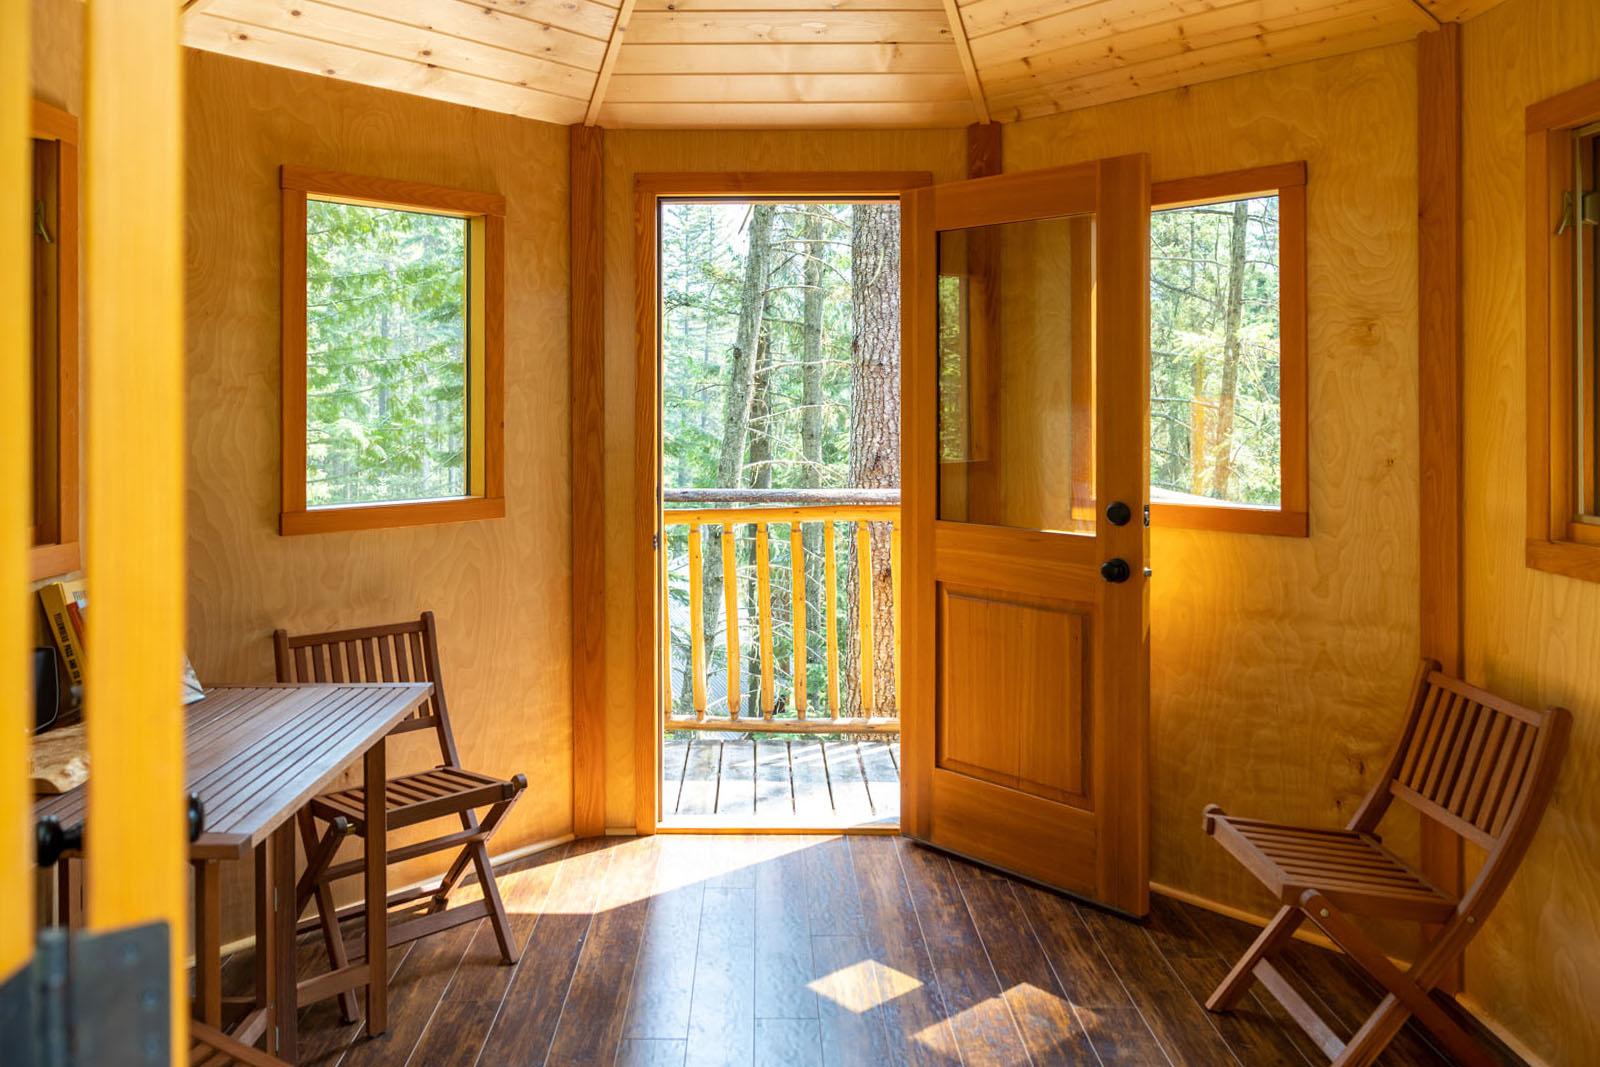 Mount robson log home 36